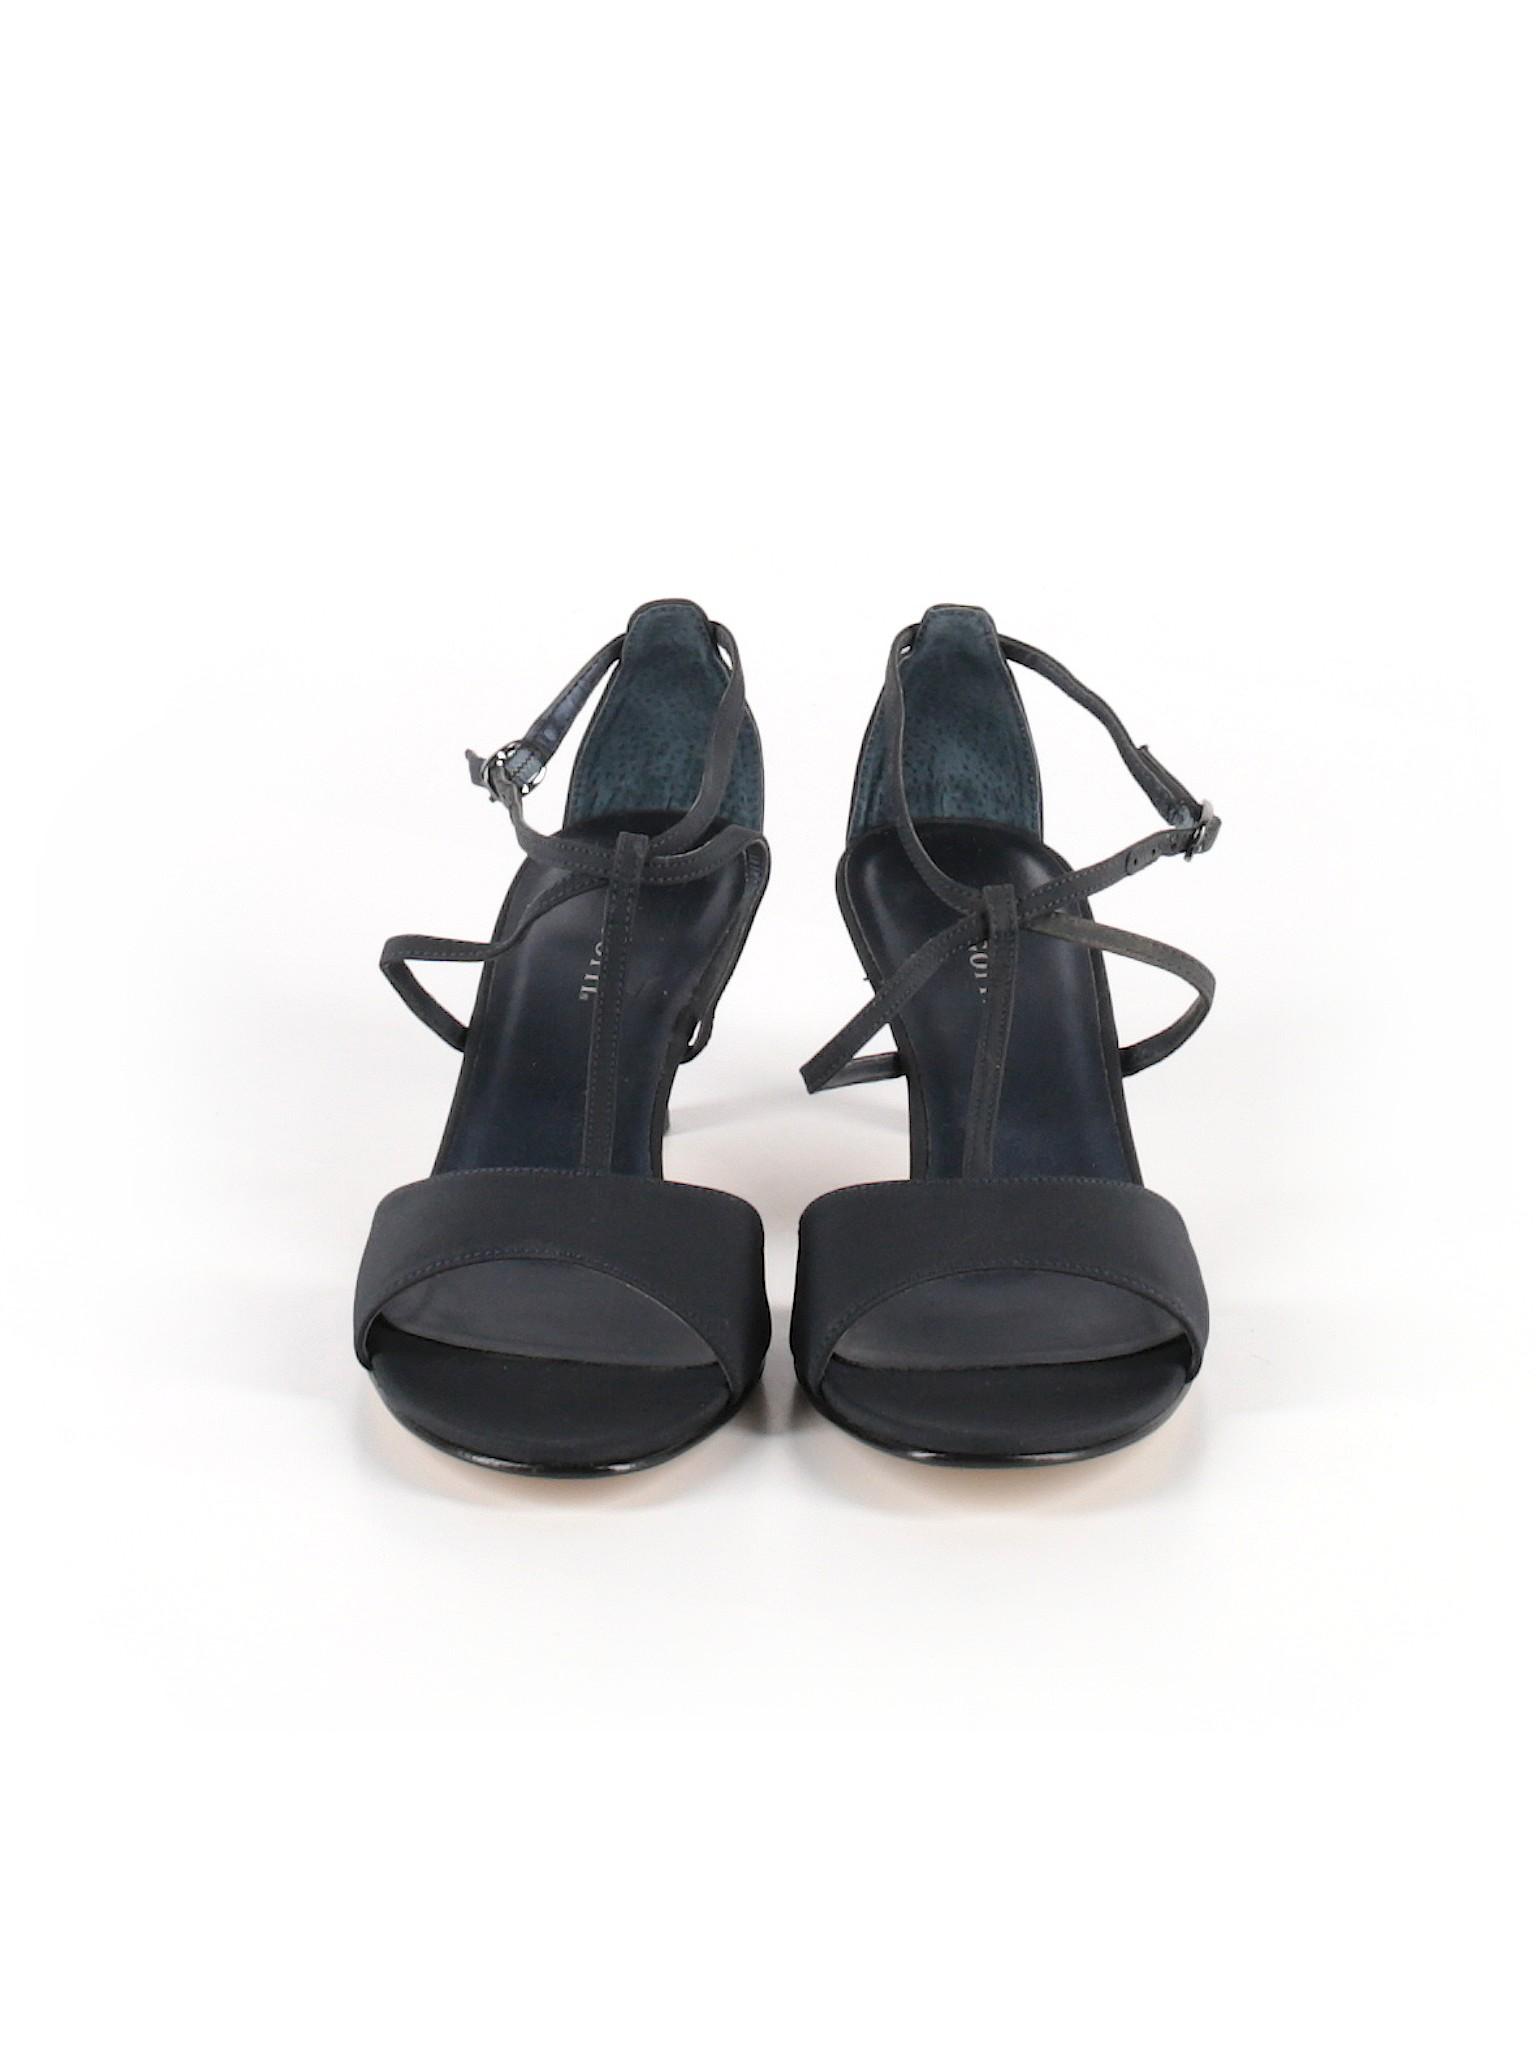 Vigotti Vigotti Heels Boutique promotion promotion promotion Heels Heels Boutique Boutique Vigotti qzvwdCP